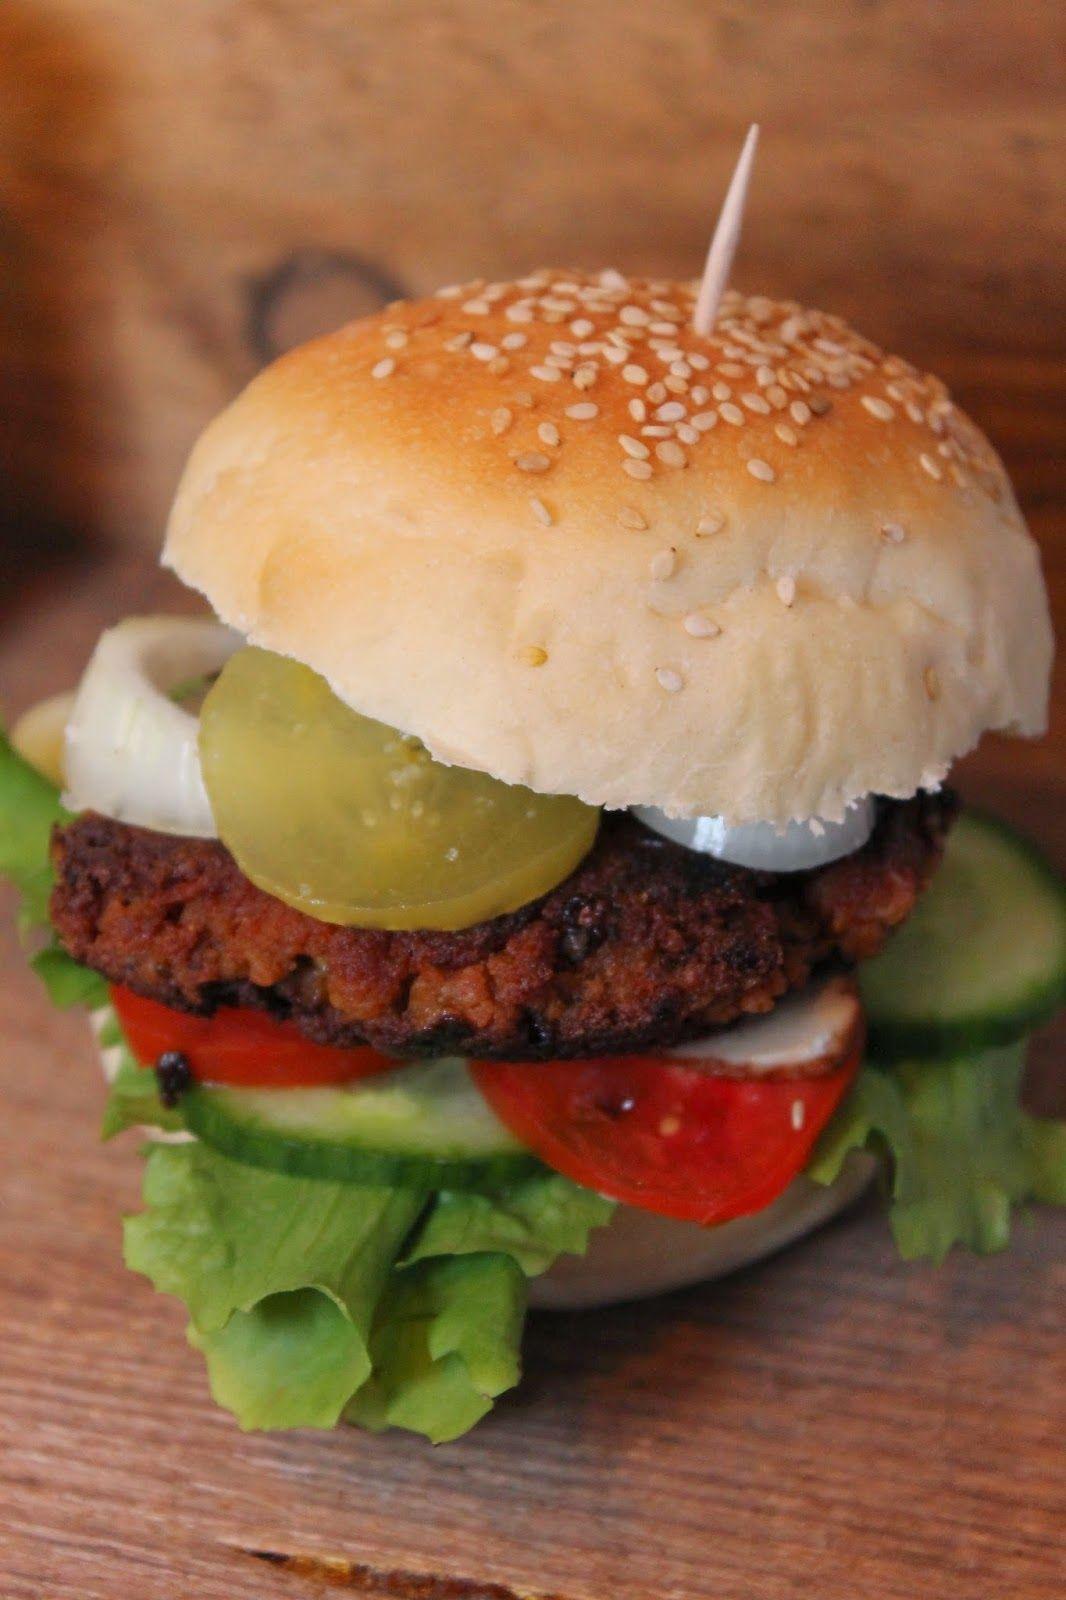 rezept gesucht rezeptkompass gefunden world s best vegan burger seitan bulette statt fleisch. Black Bedroom Furniture Sets. Home Design Ideas